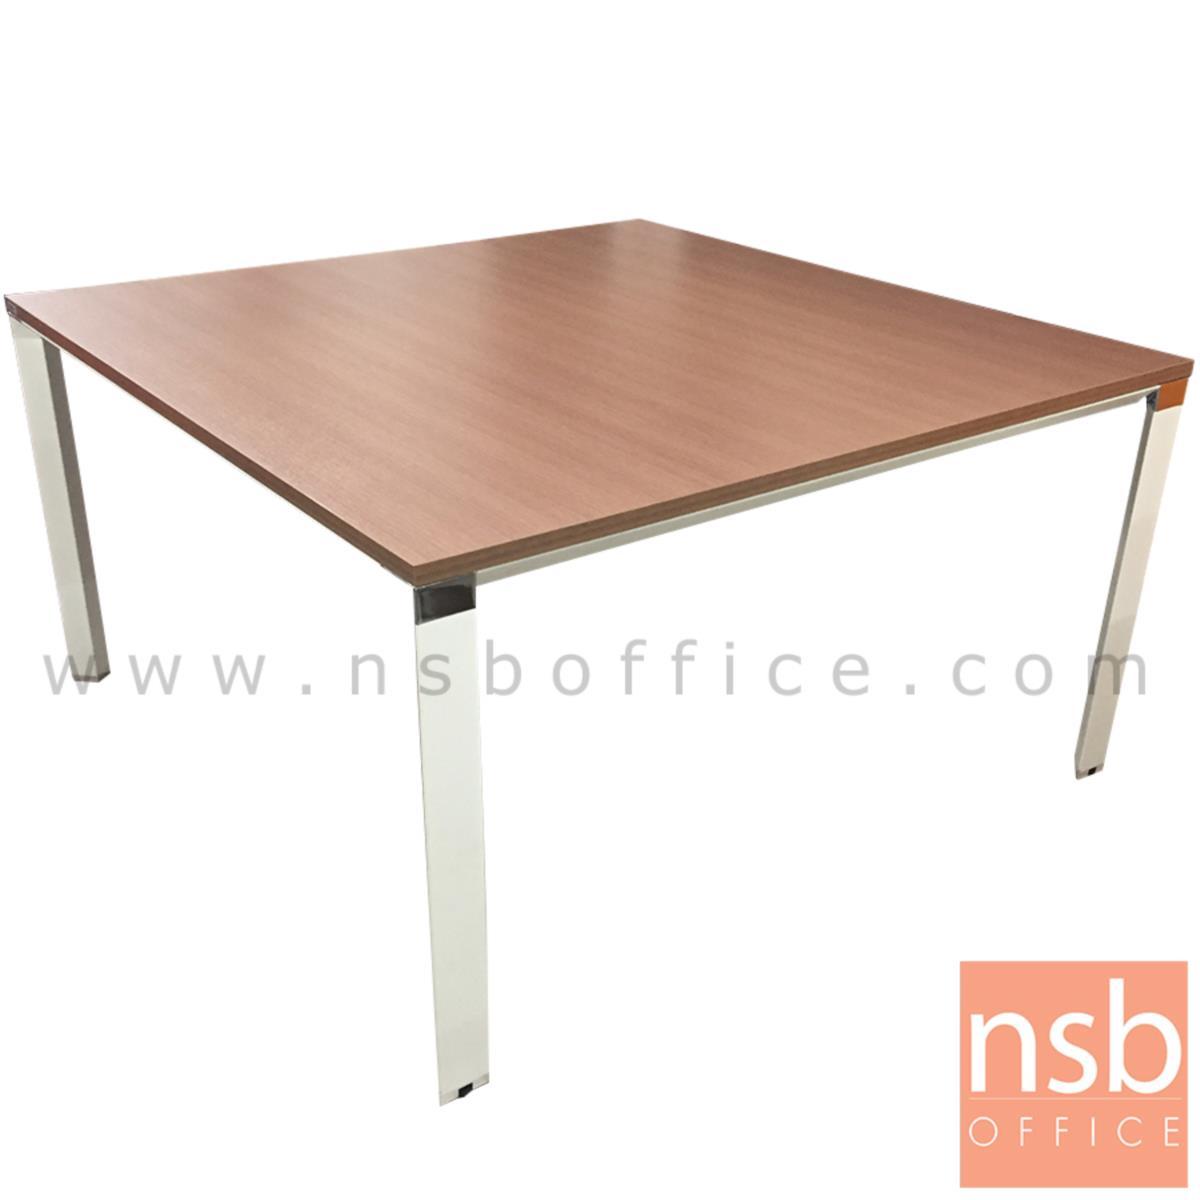 A05A088:โต๊ะประชุมทรงสี่เหลี่ยม รุ่น Hagrid (ฮากริด) ขนาด 100W ,140W cm. ขาเหล็กสีขาว